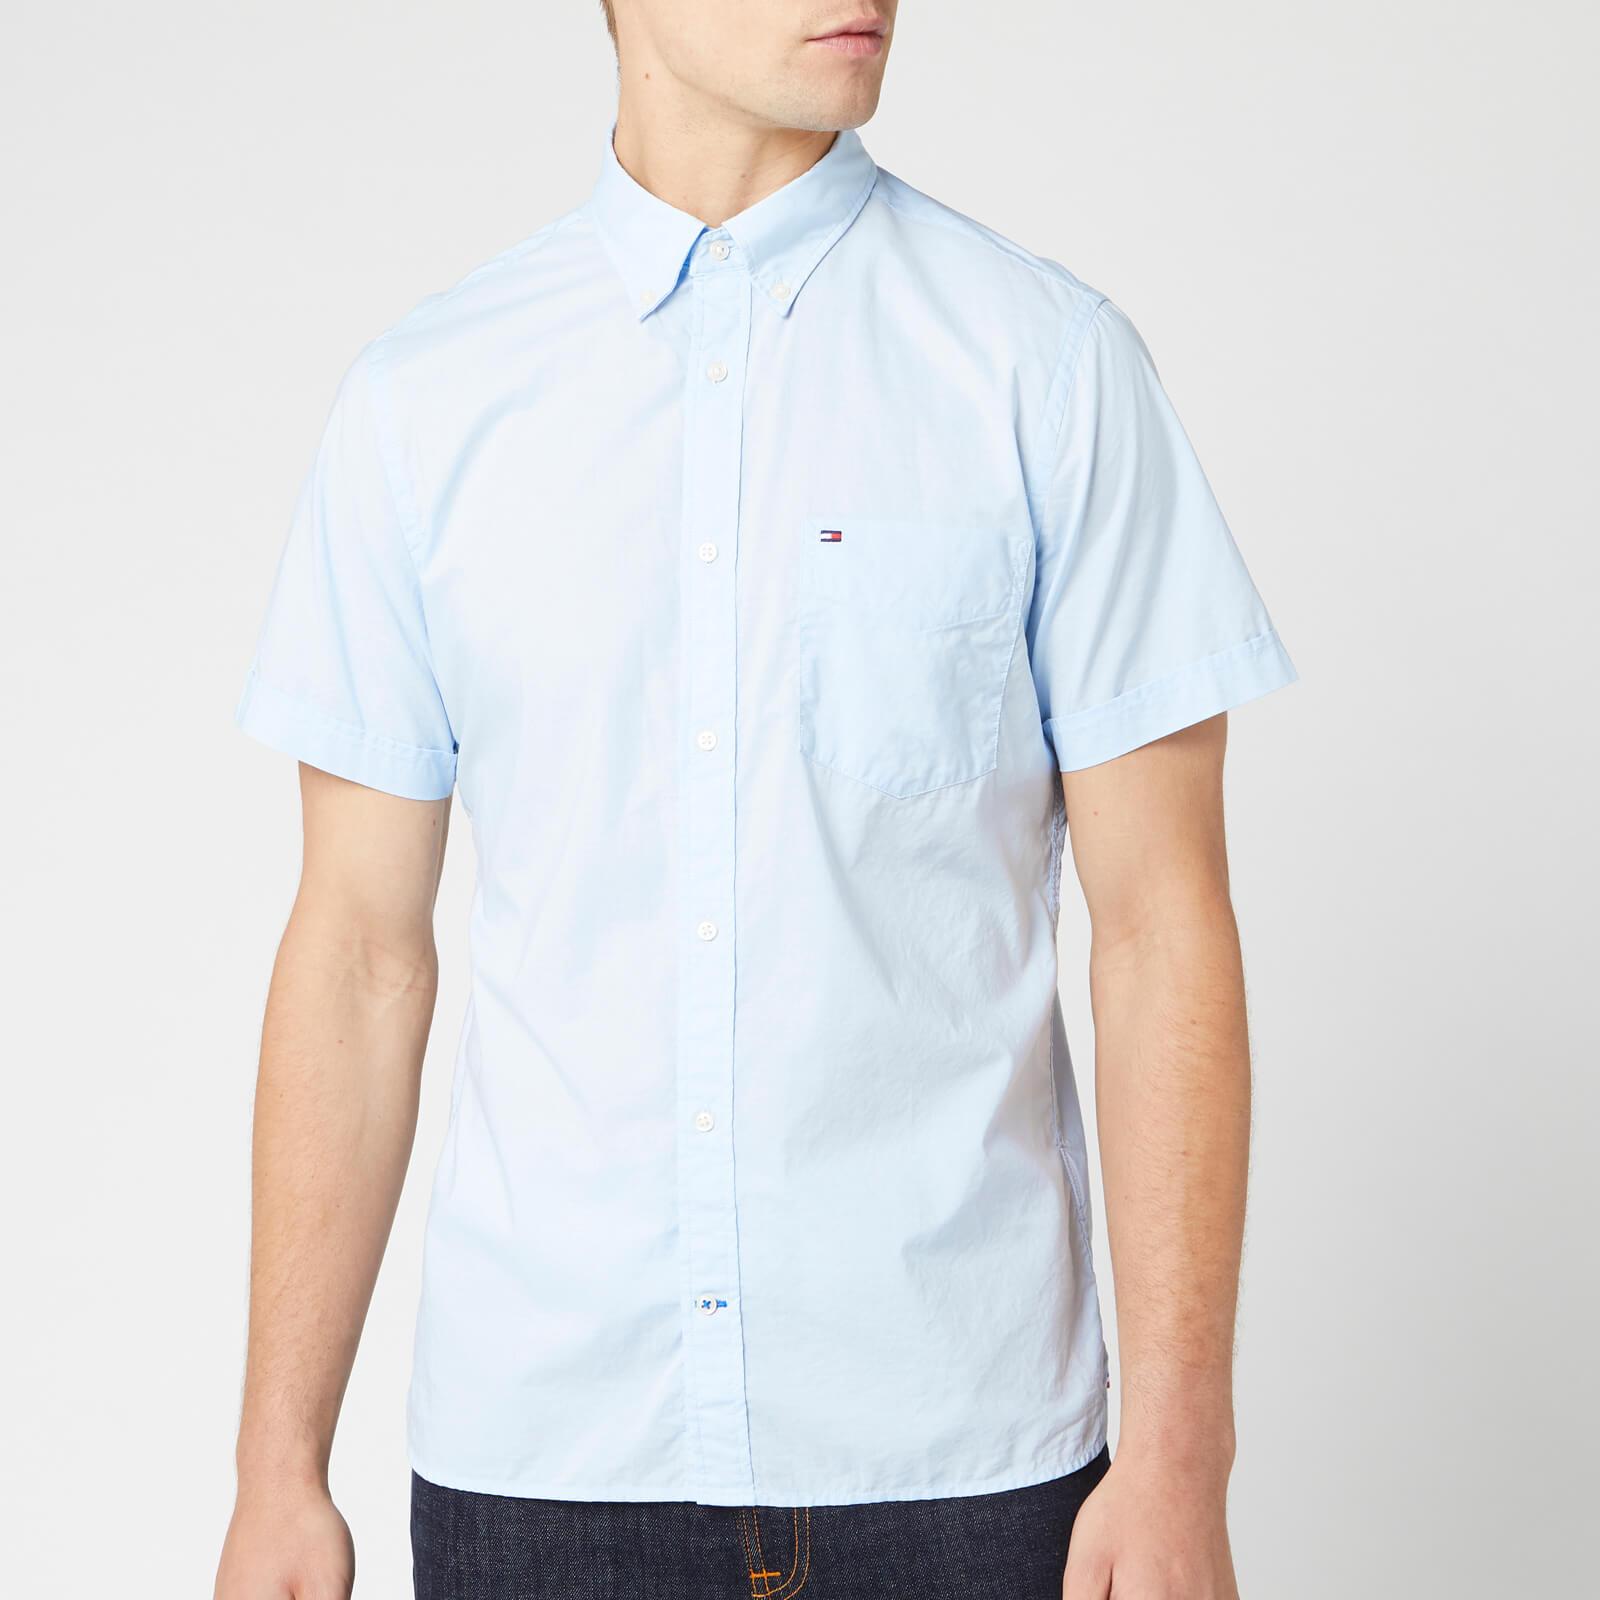 Tommy Hilfiger Men's Slim Summer Poplin Shirt - Chambray Blue - L - Blue